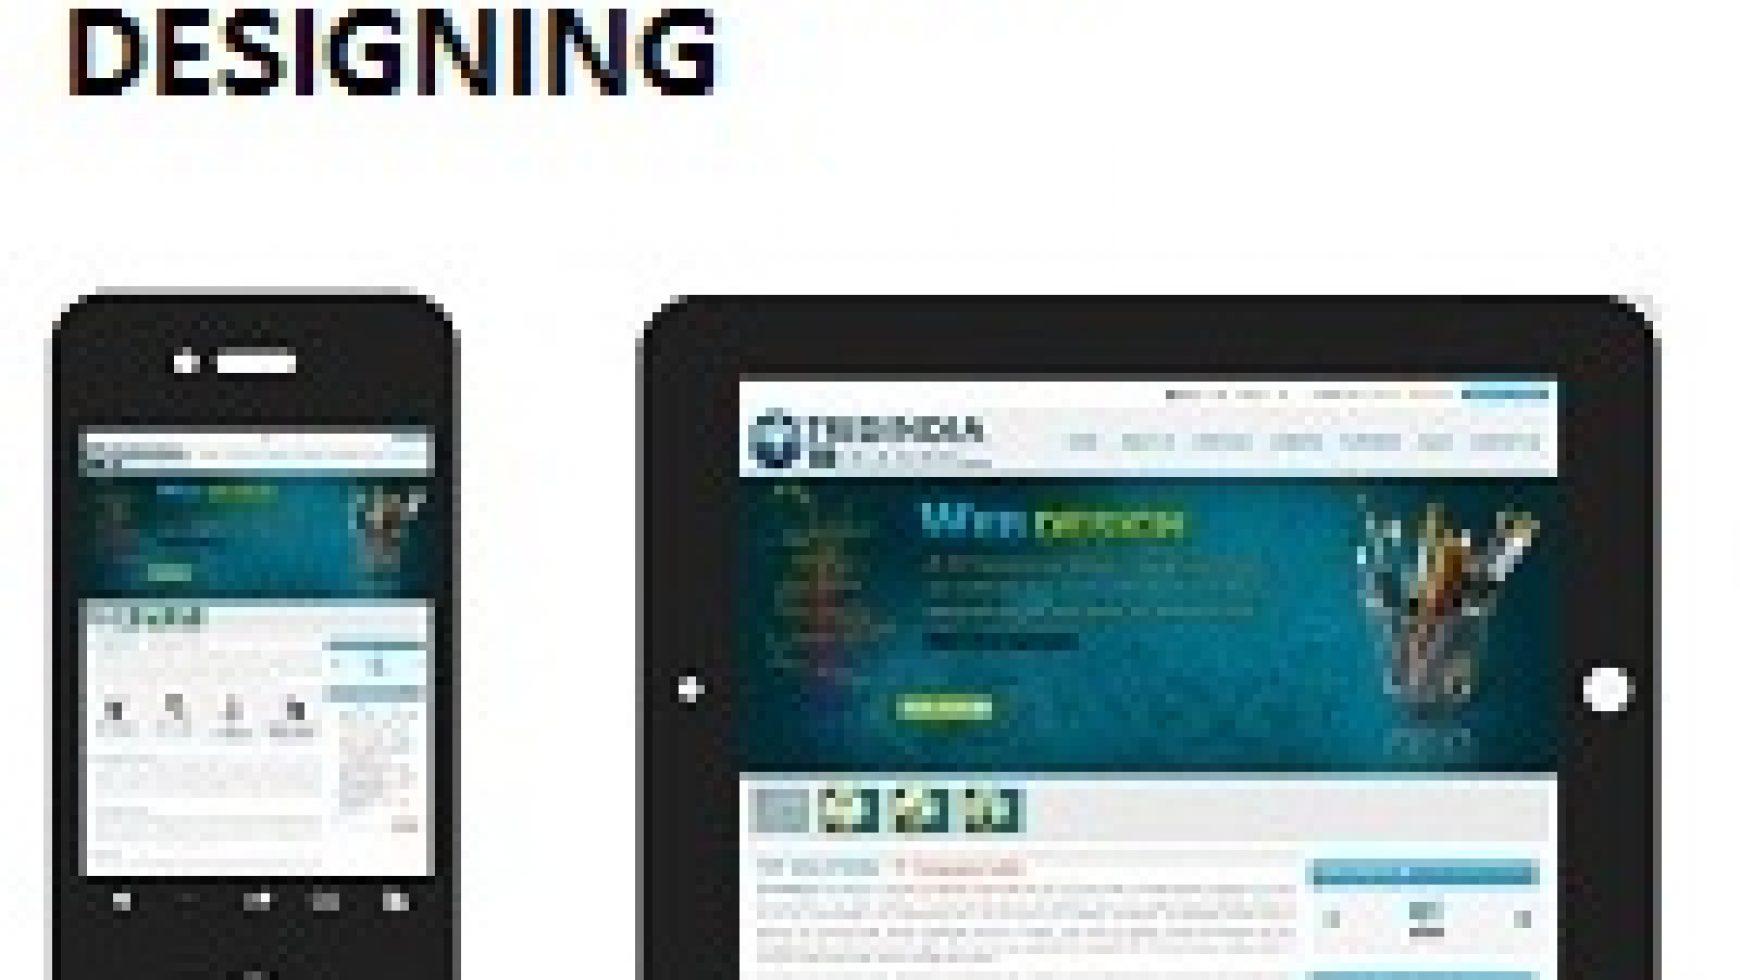 RESPONSIVE WEB DESIGNING: THE WAY FORWARD